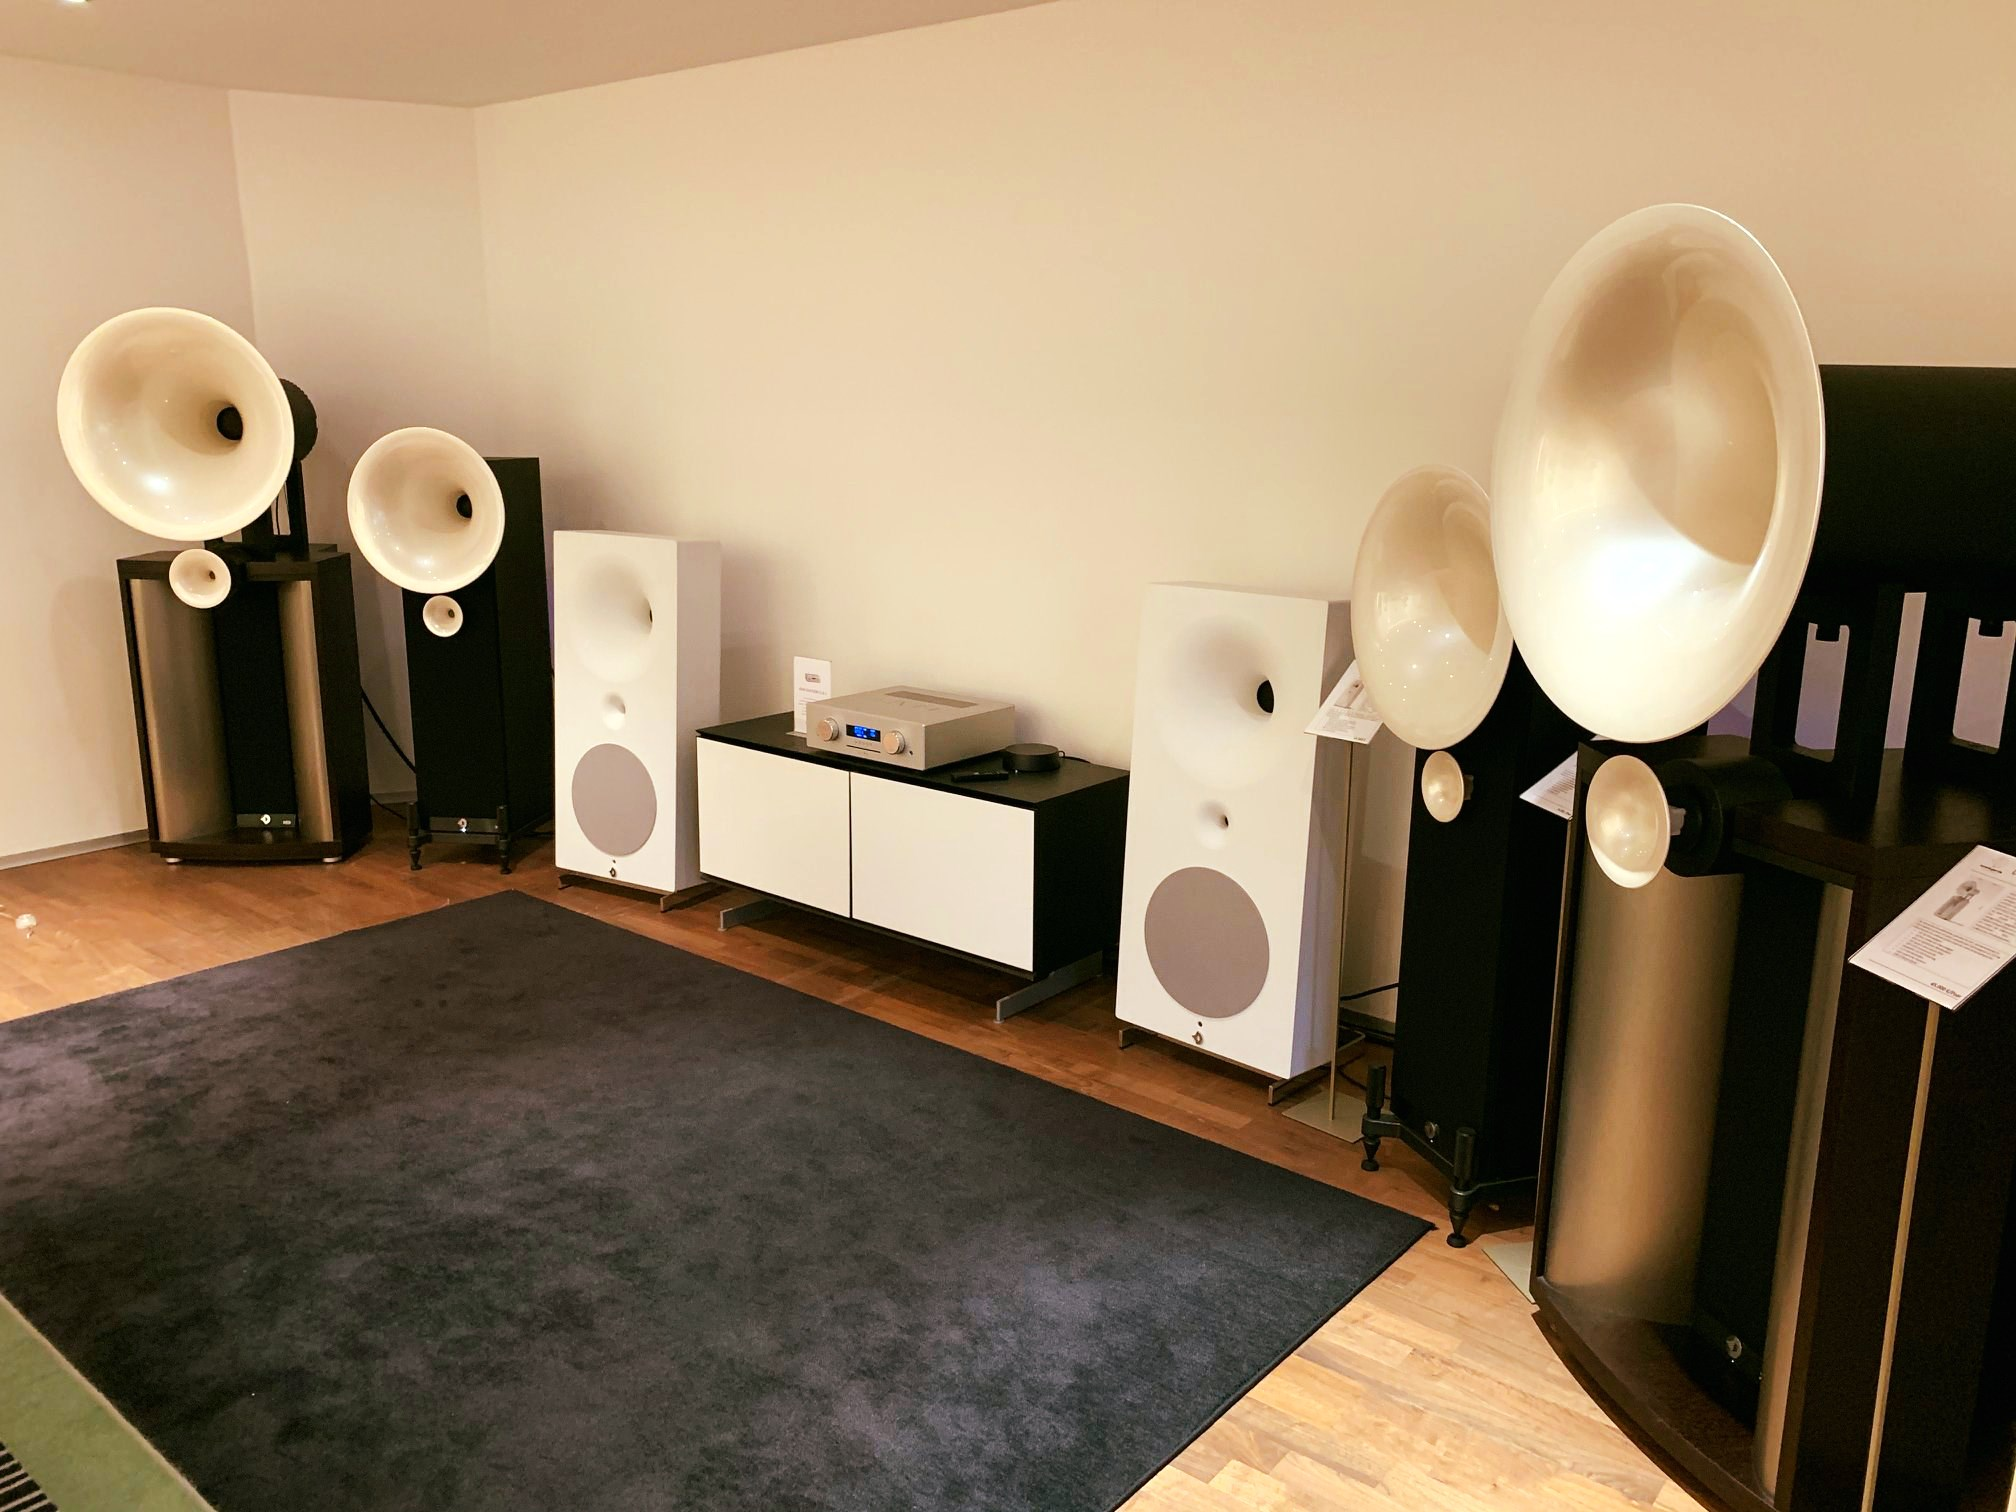 Probieren geht über Studieren. Hornlautsprecher von Avantgarde Acoustic. Muss ma…